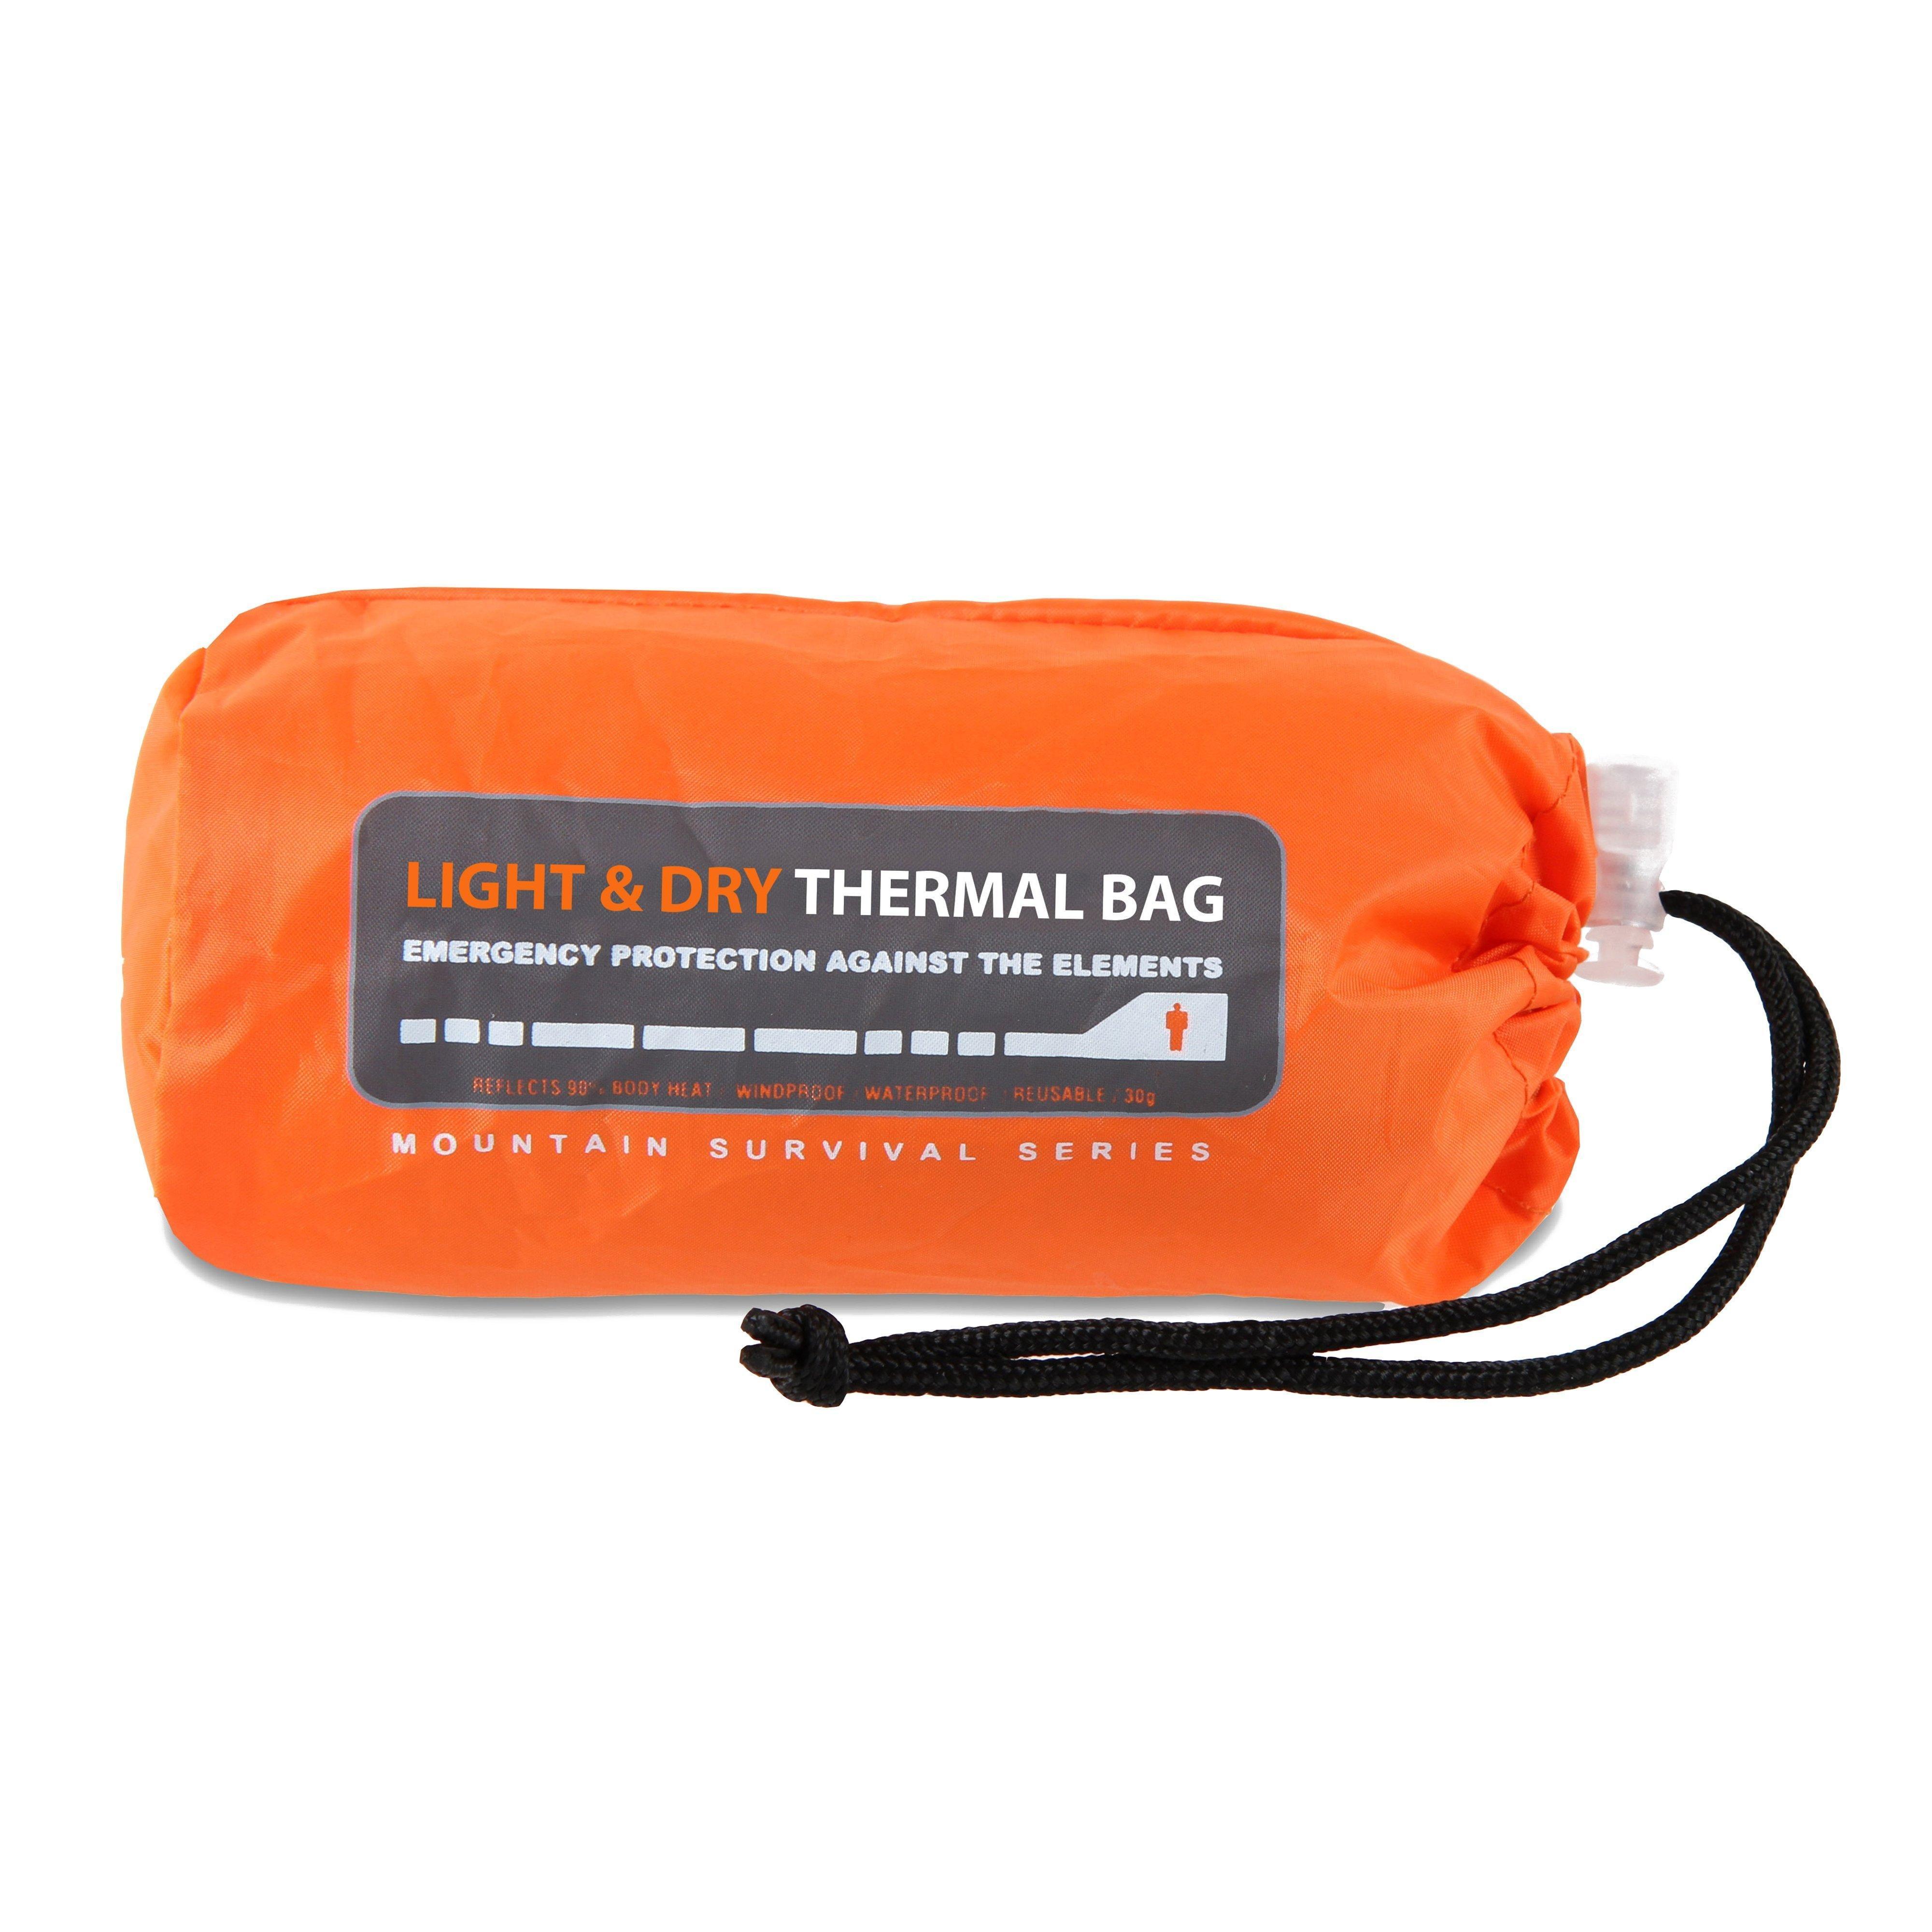 Lifesystems Lifesystems Light and Dry Thermal Bivi - Orange, Orange